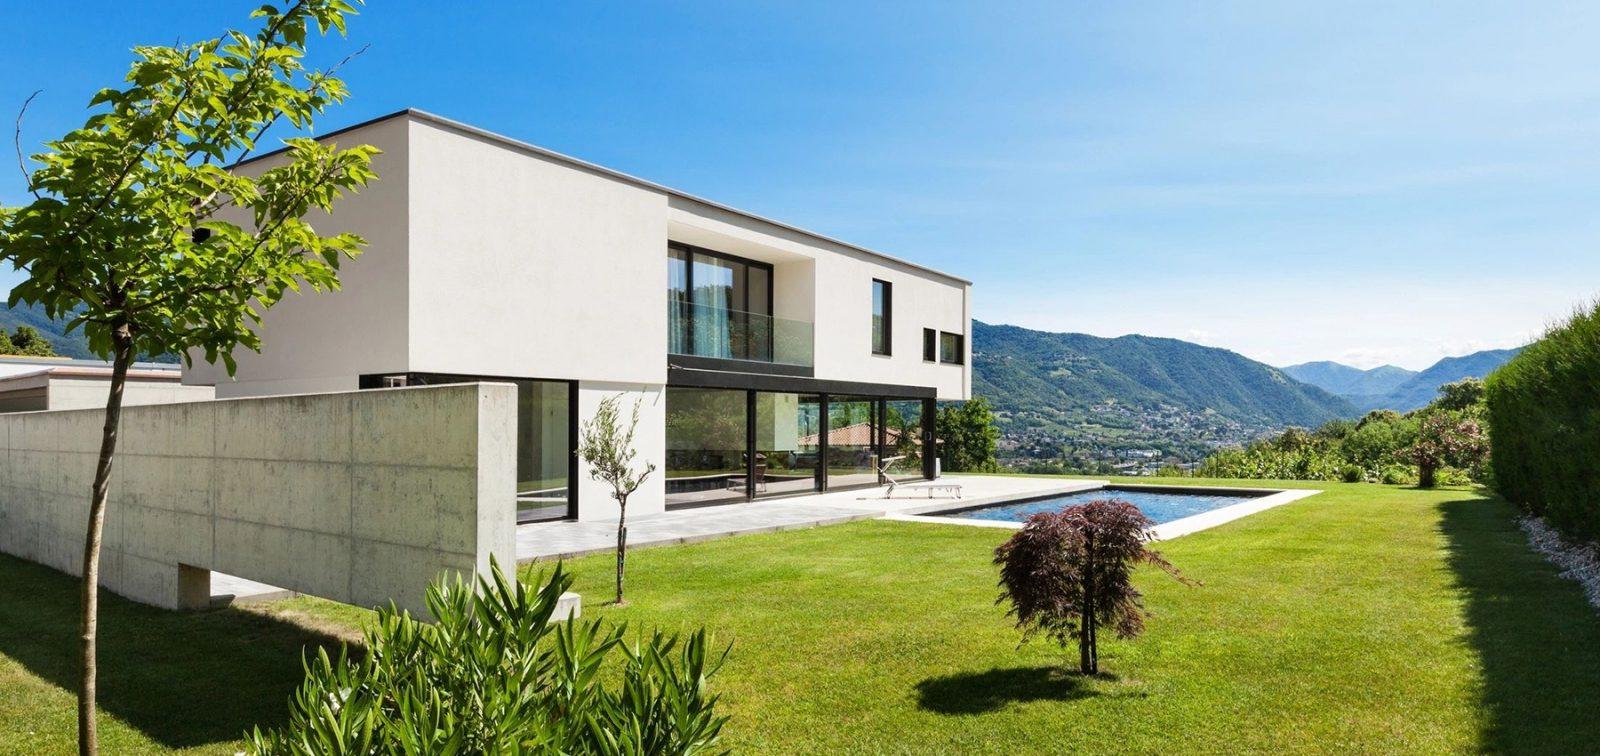 White Glassy House Star